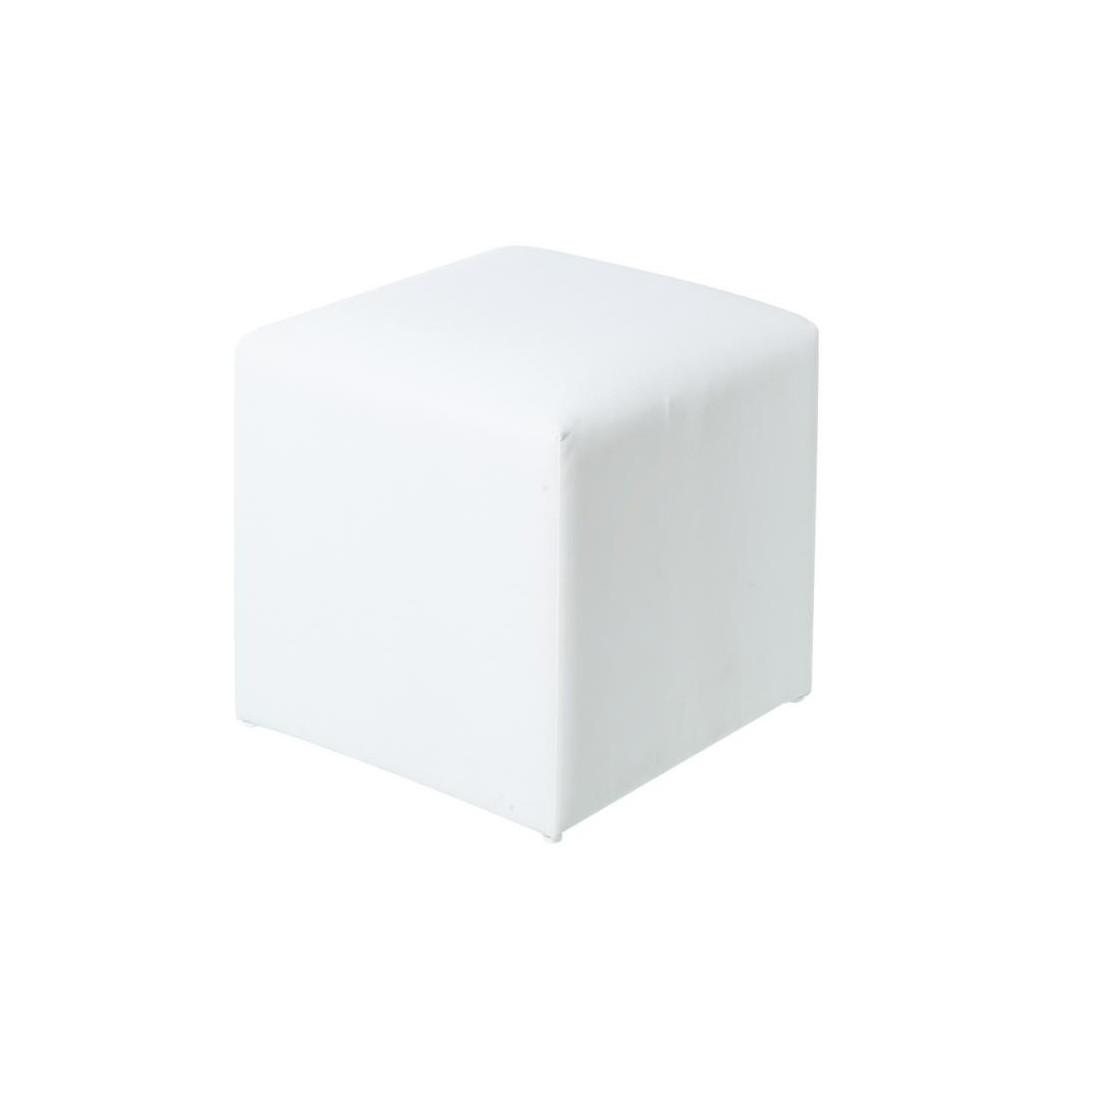 d tube pouf exterieur mer exterieur pouf tube d mer 6yfIvYb7g